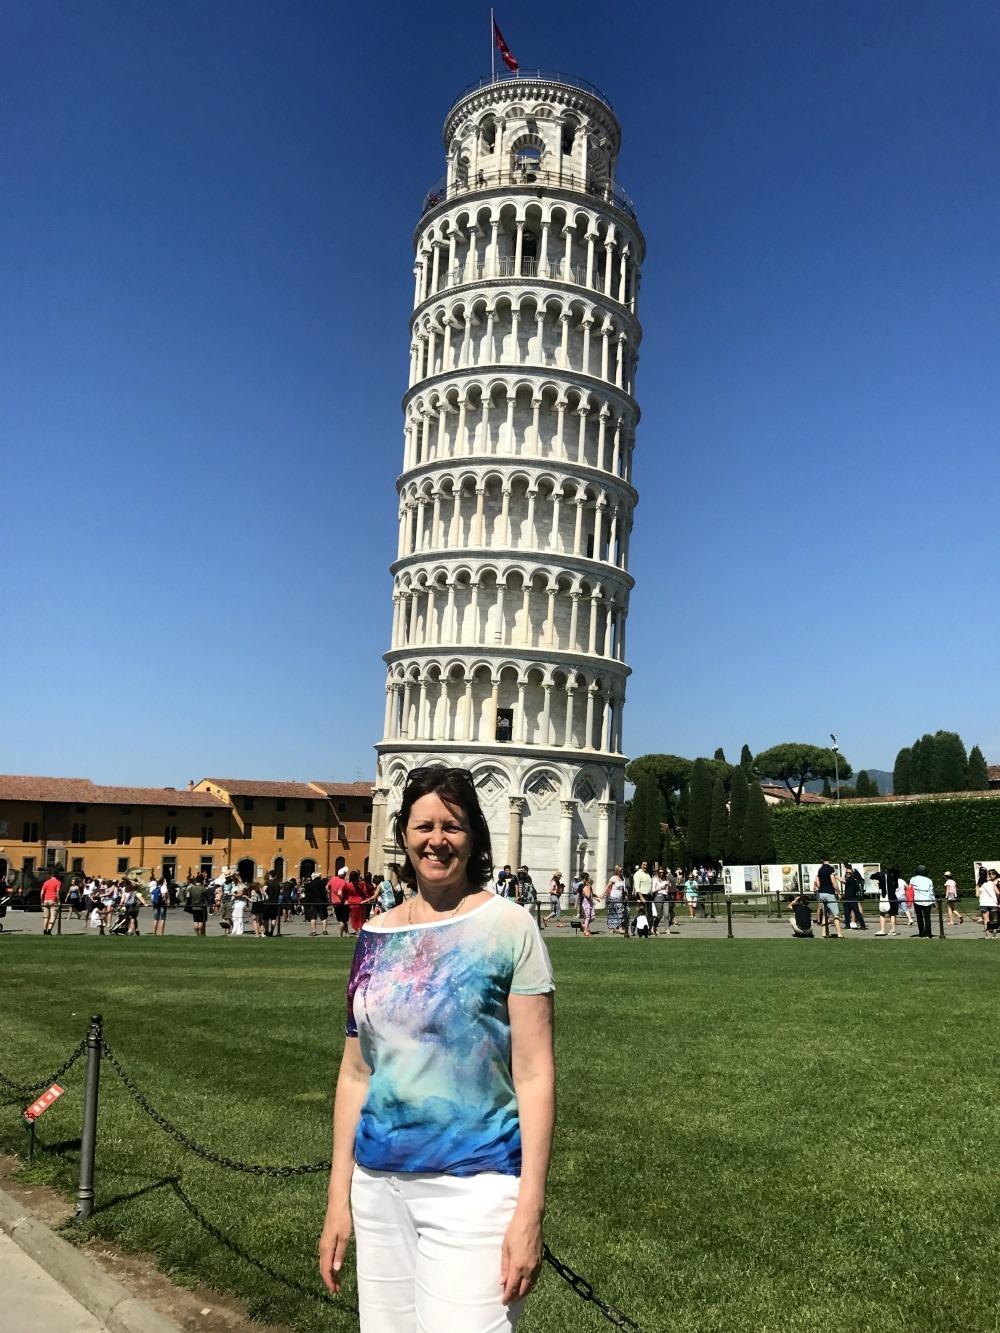 What to see in Pisa - Leaning tower of Pisa Photo Heatheronhertravels.com